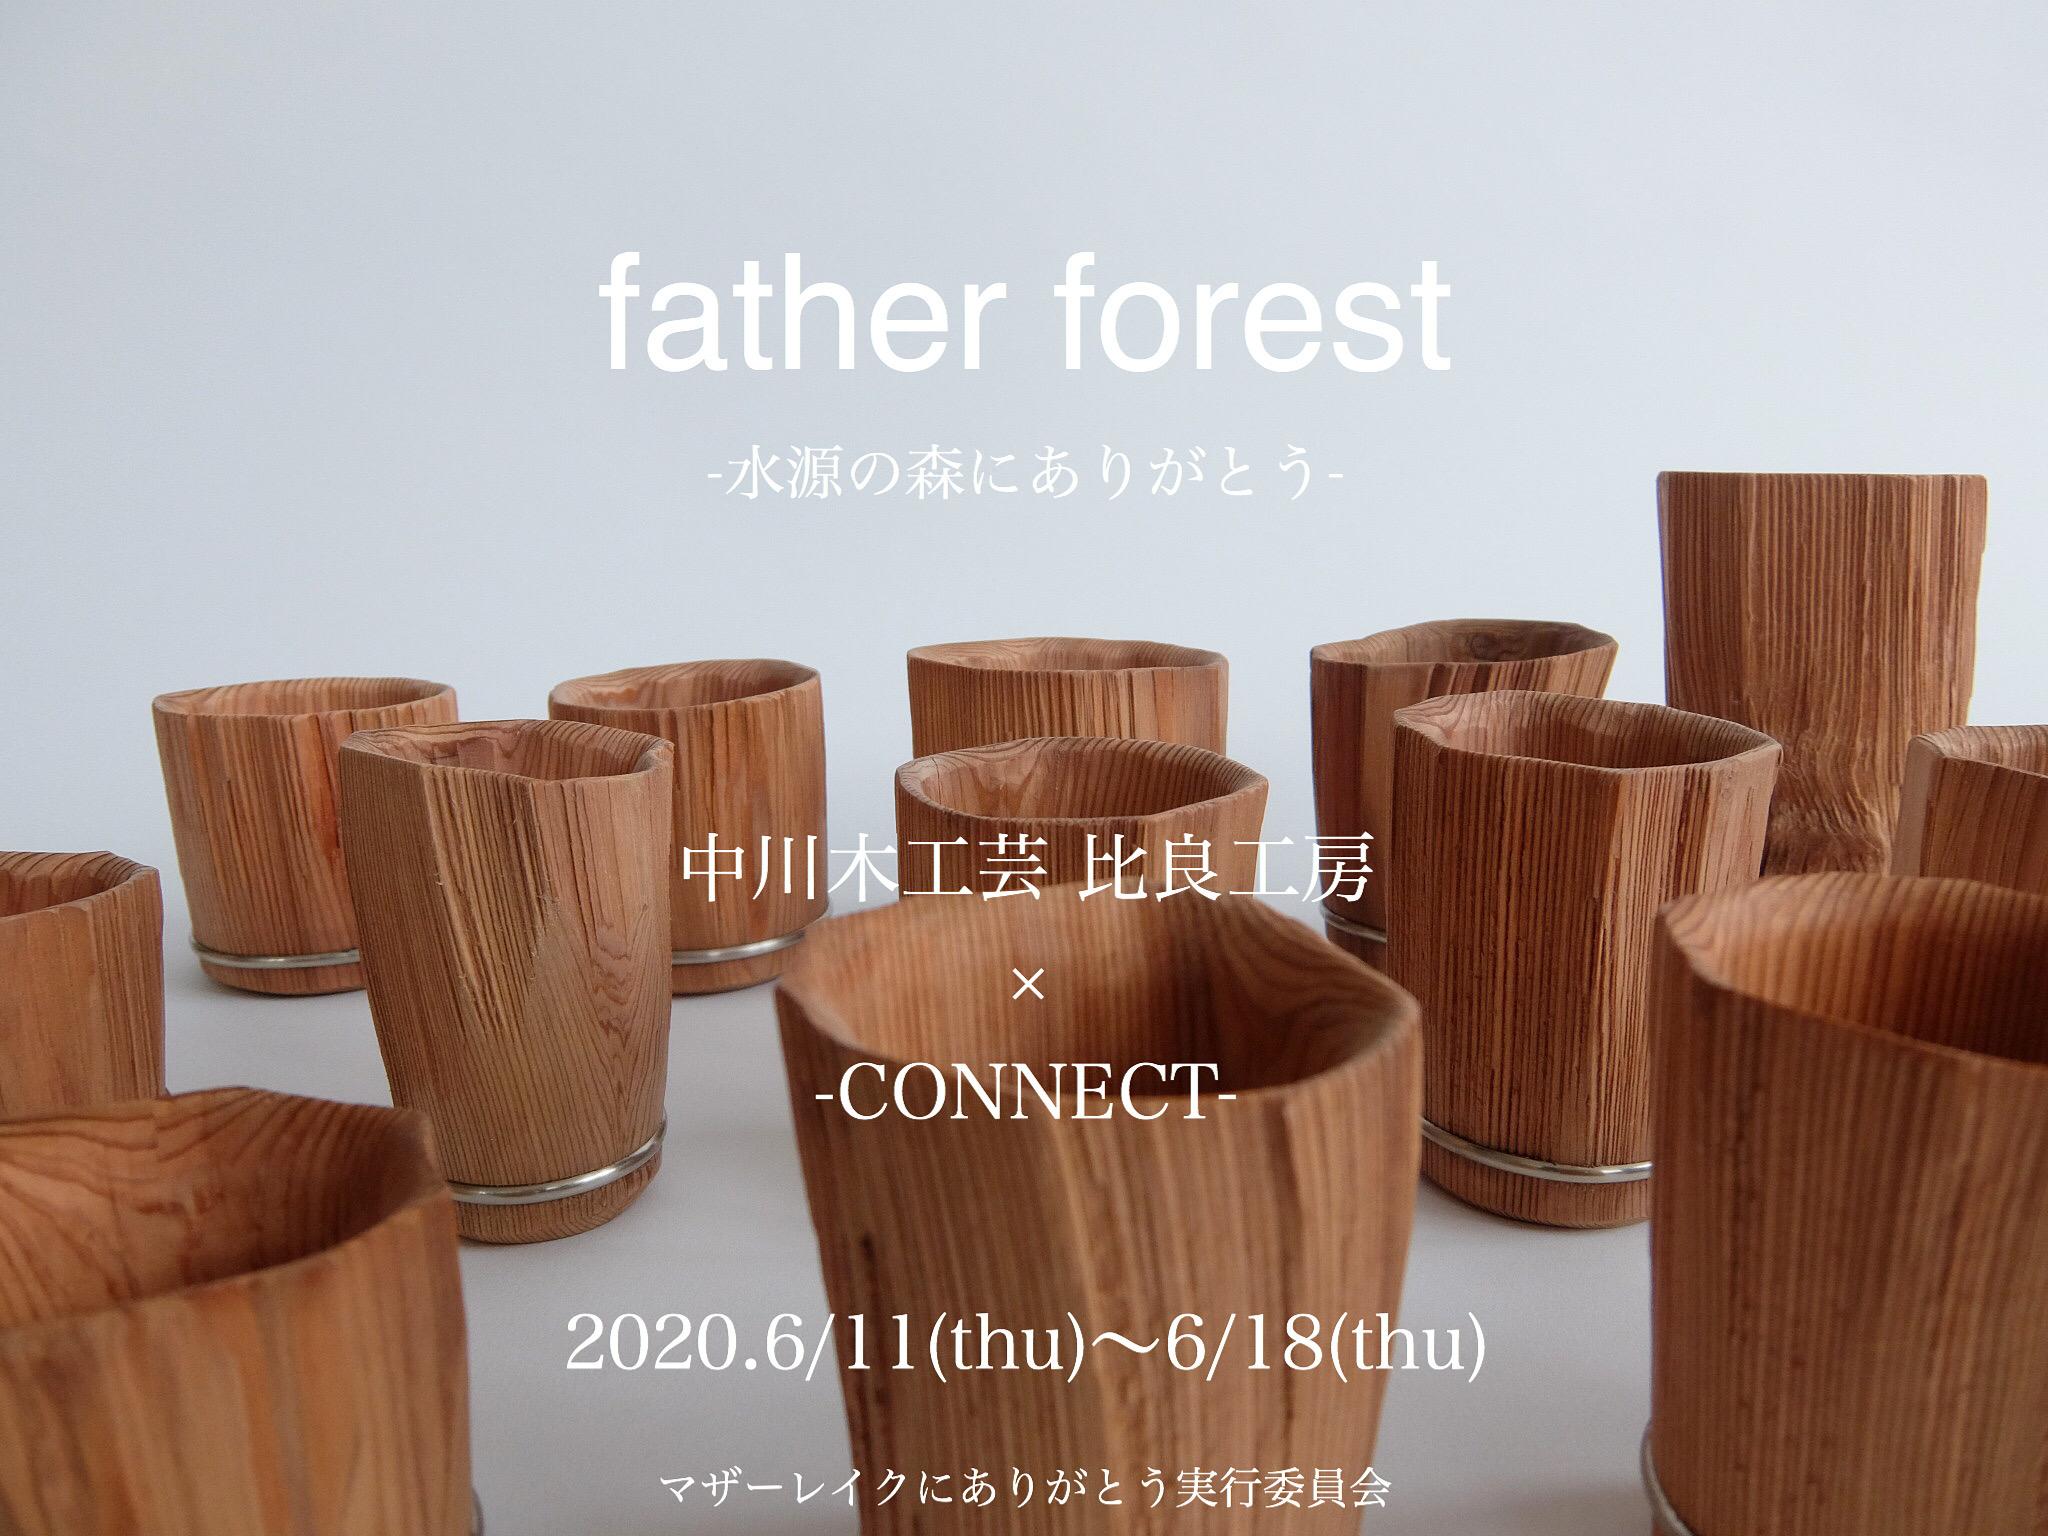 『father forest -水源の森にありがとう-』展示販売会